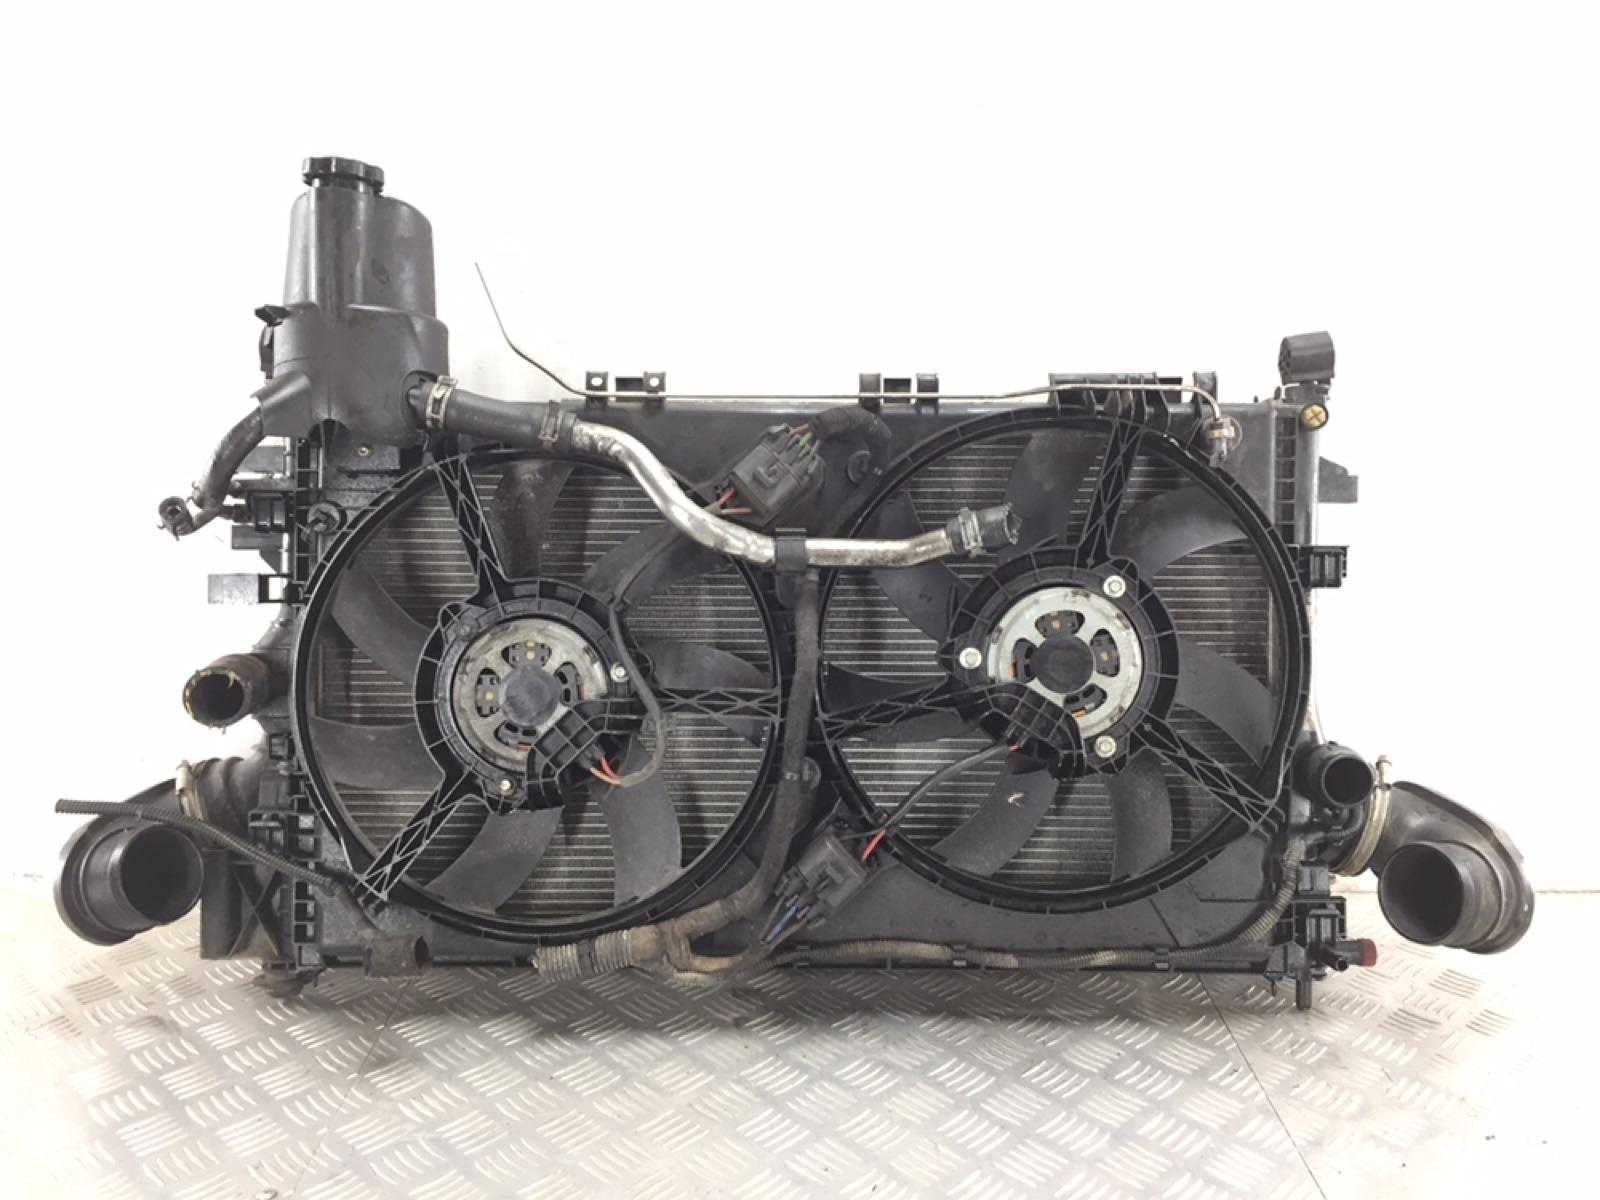 Кассета радиаторов Opel Insignia 2.0 CDTI 2010 (б/у)